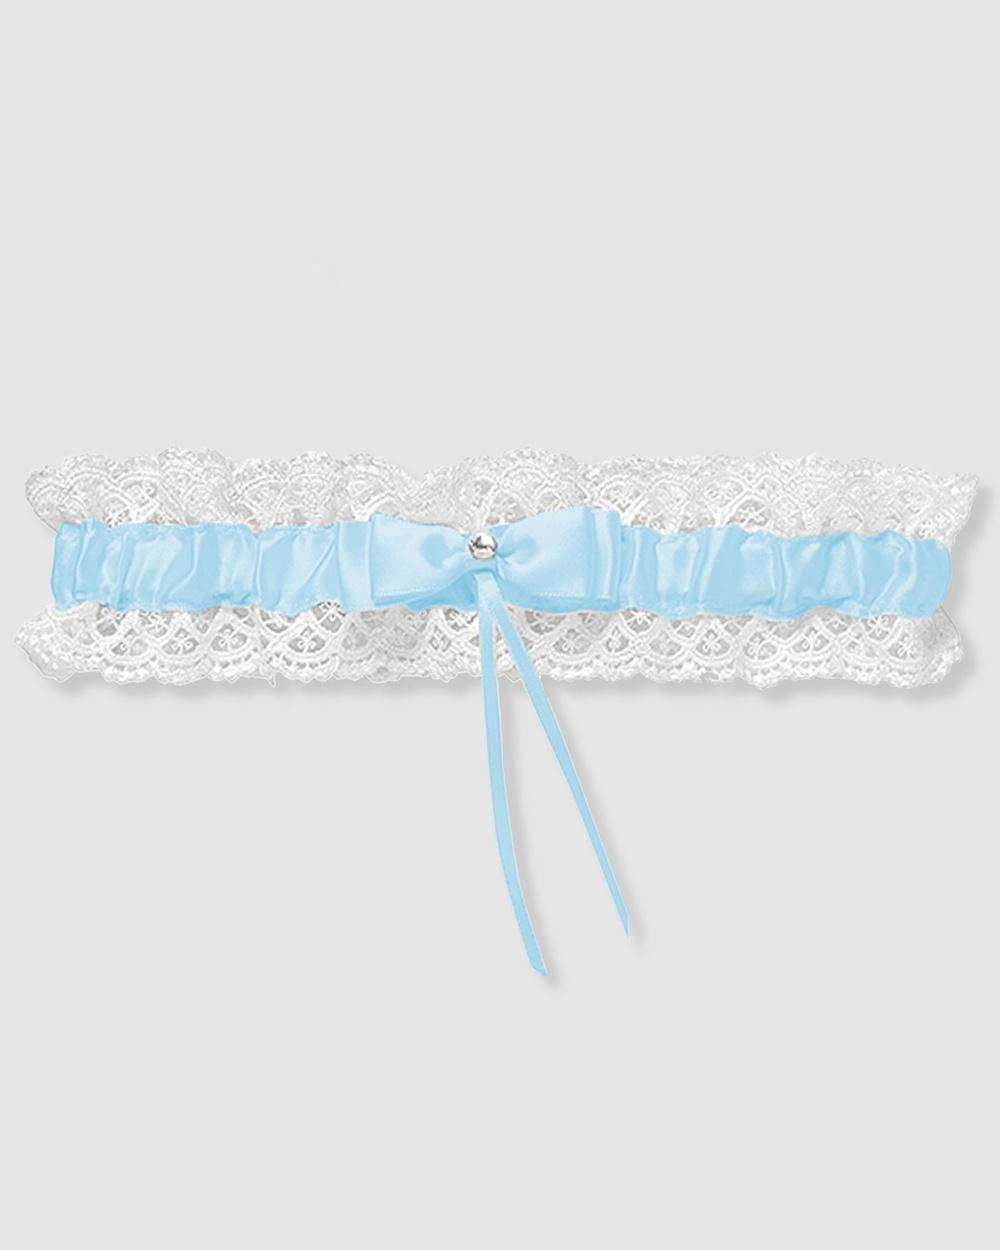 B Free Intimate Apparel Bridal Garter Vintage Lace Wedding & Baby Blue